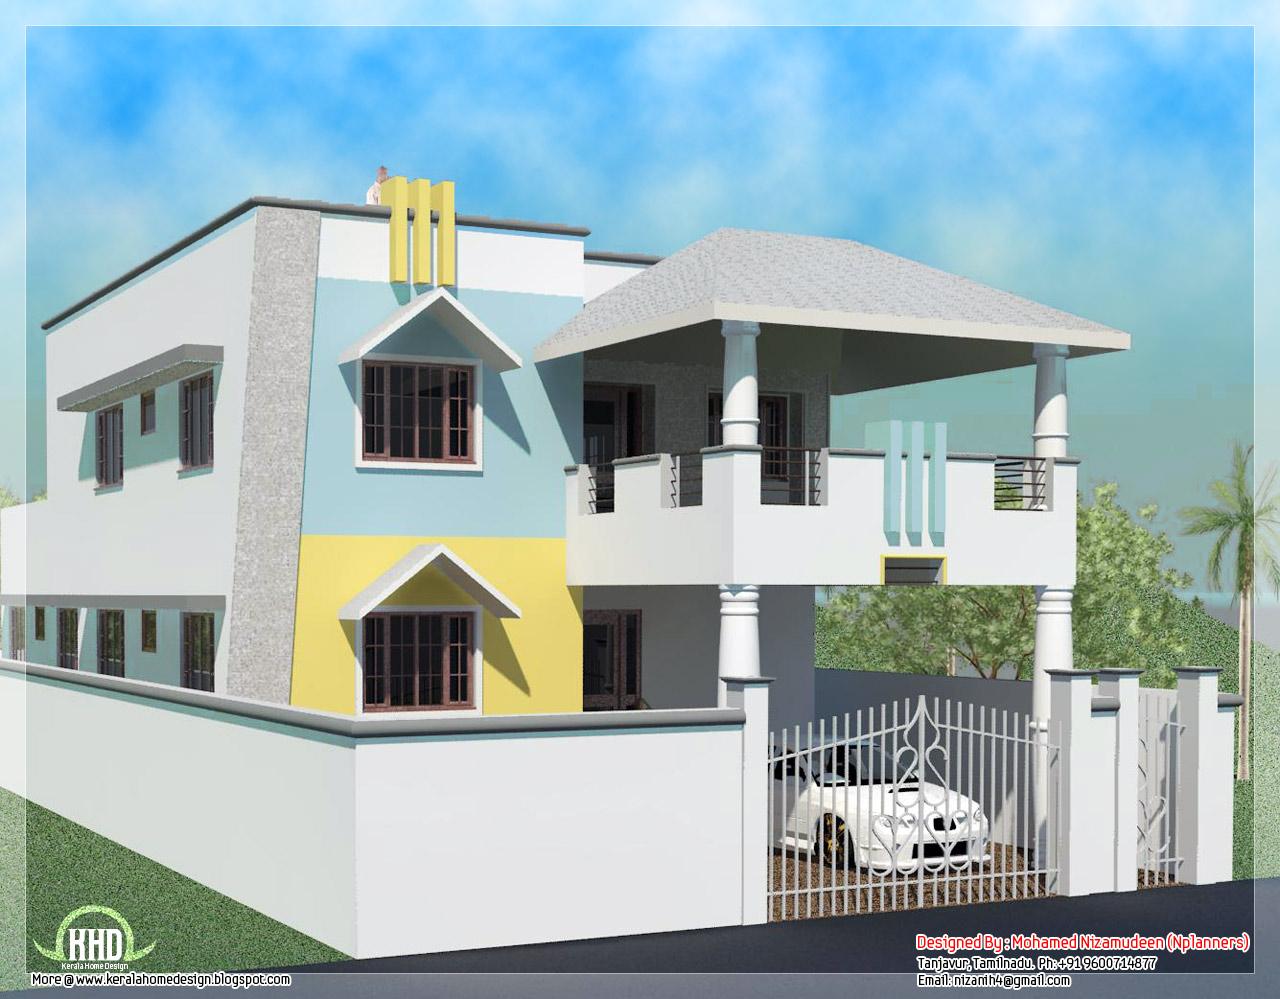 tamilnadu home plans with photos | amazing house plans